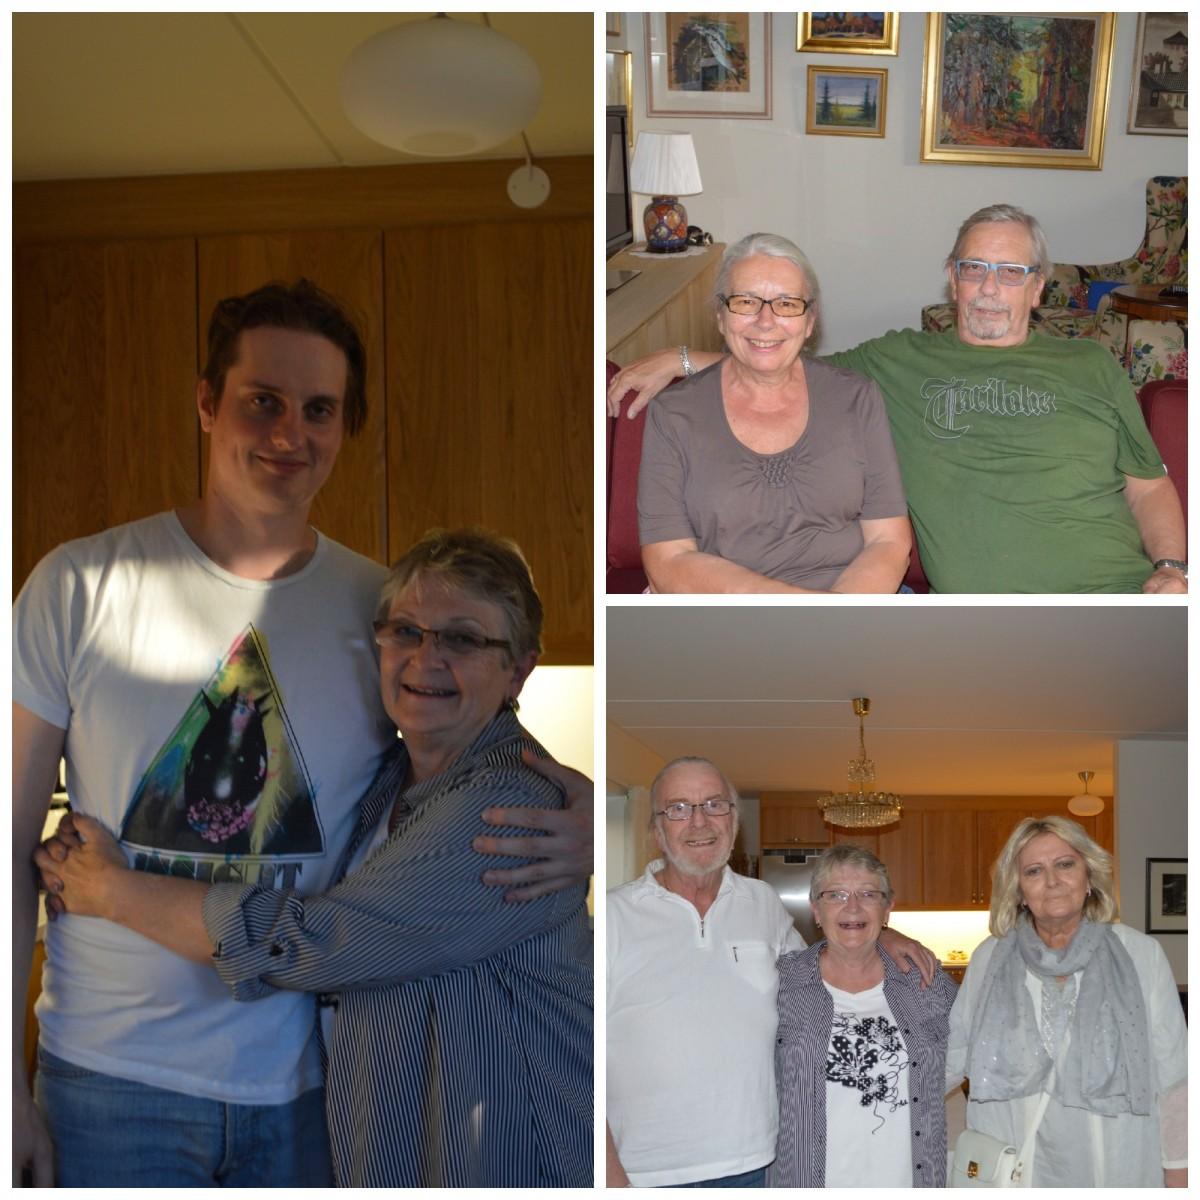 Norwegian Family Collage